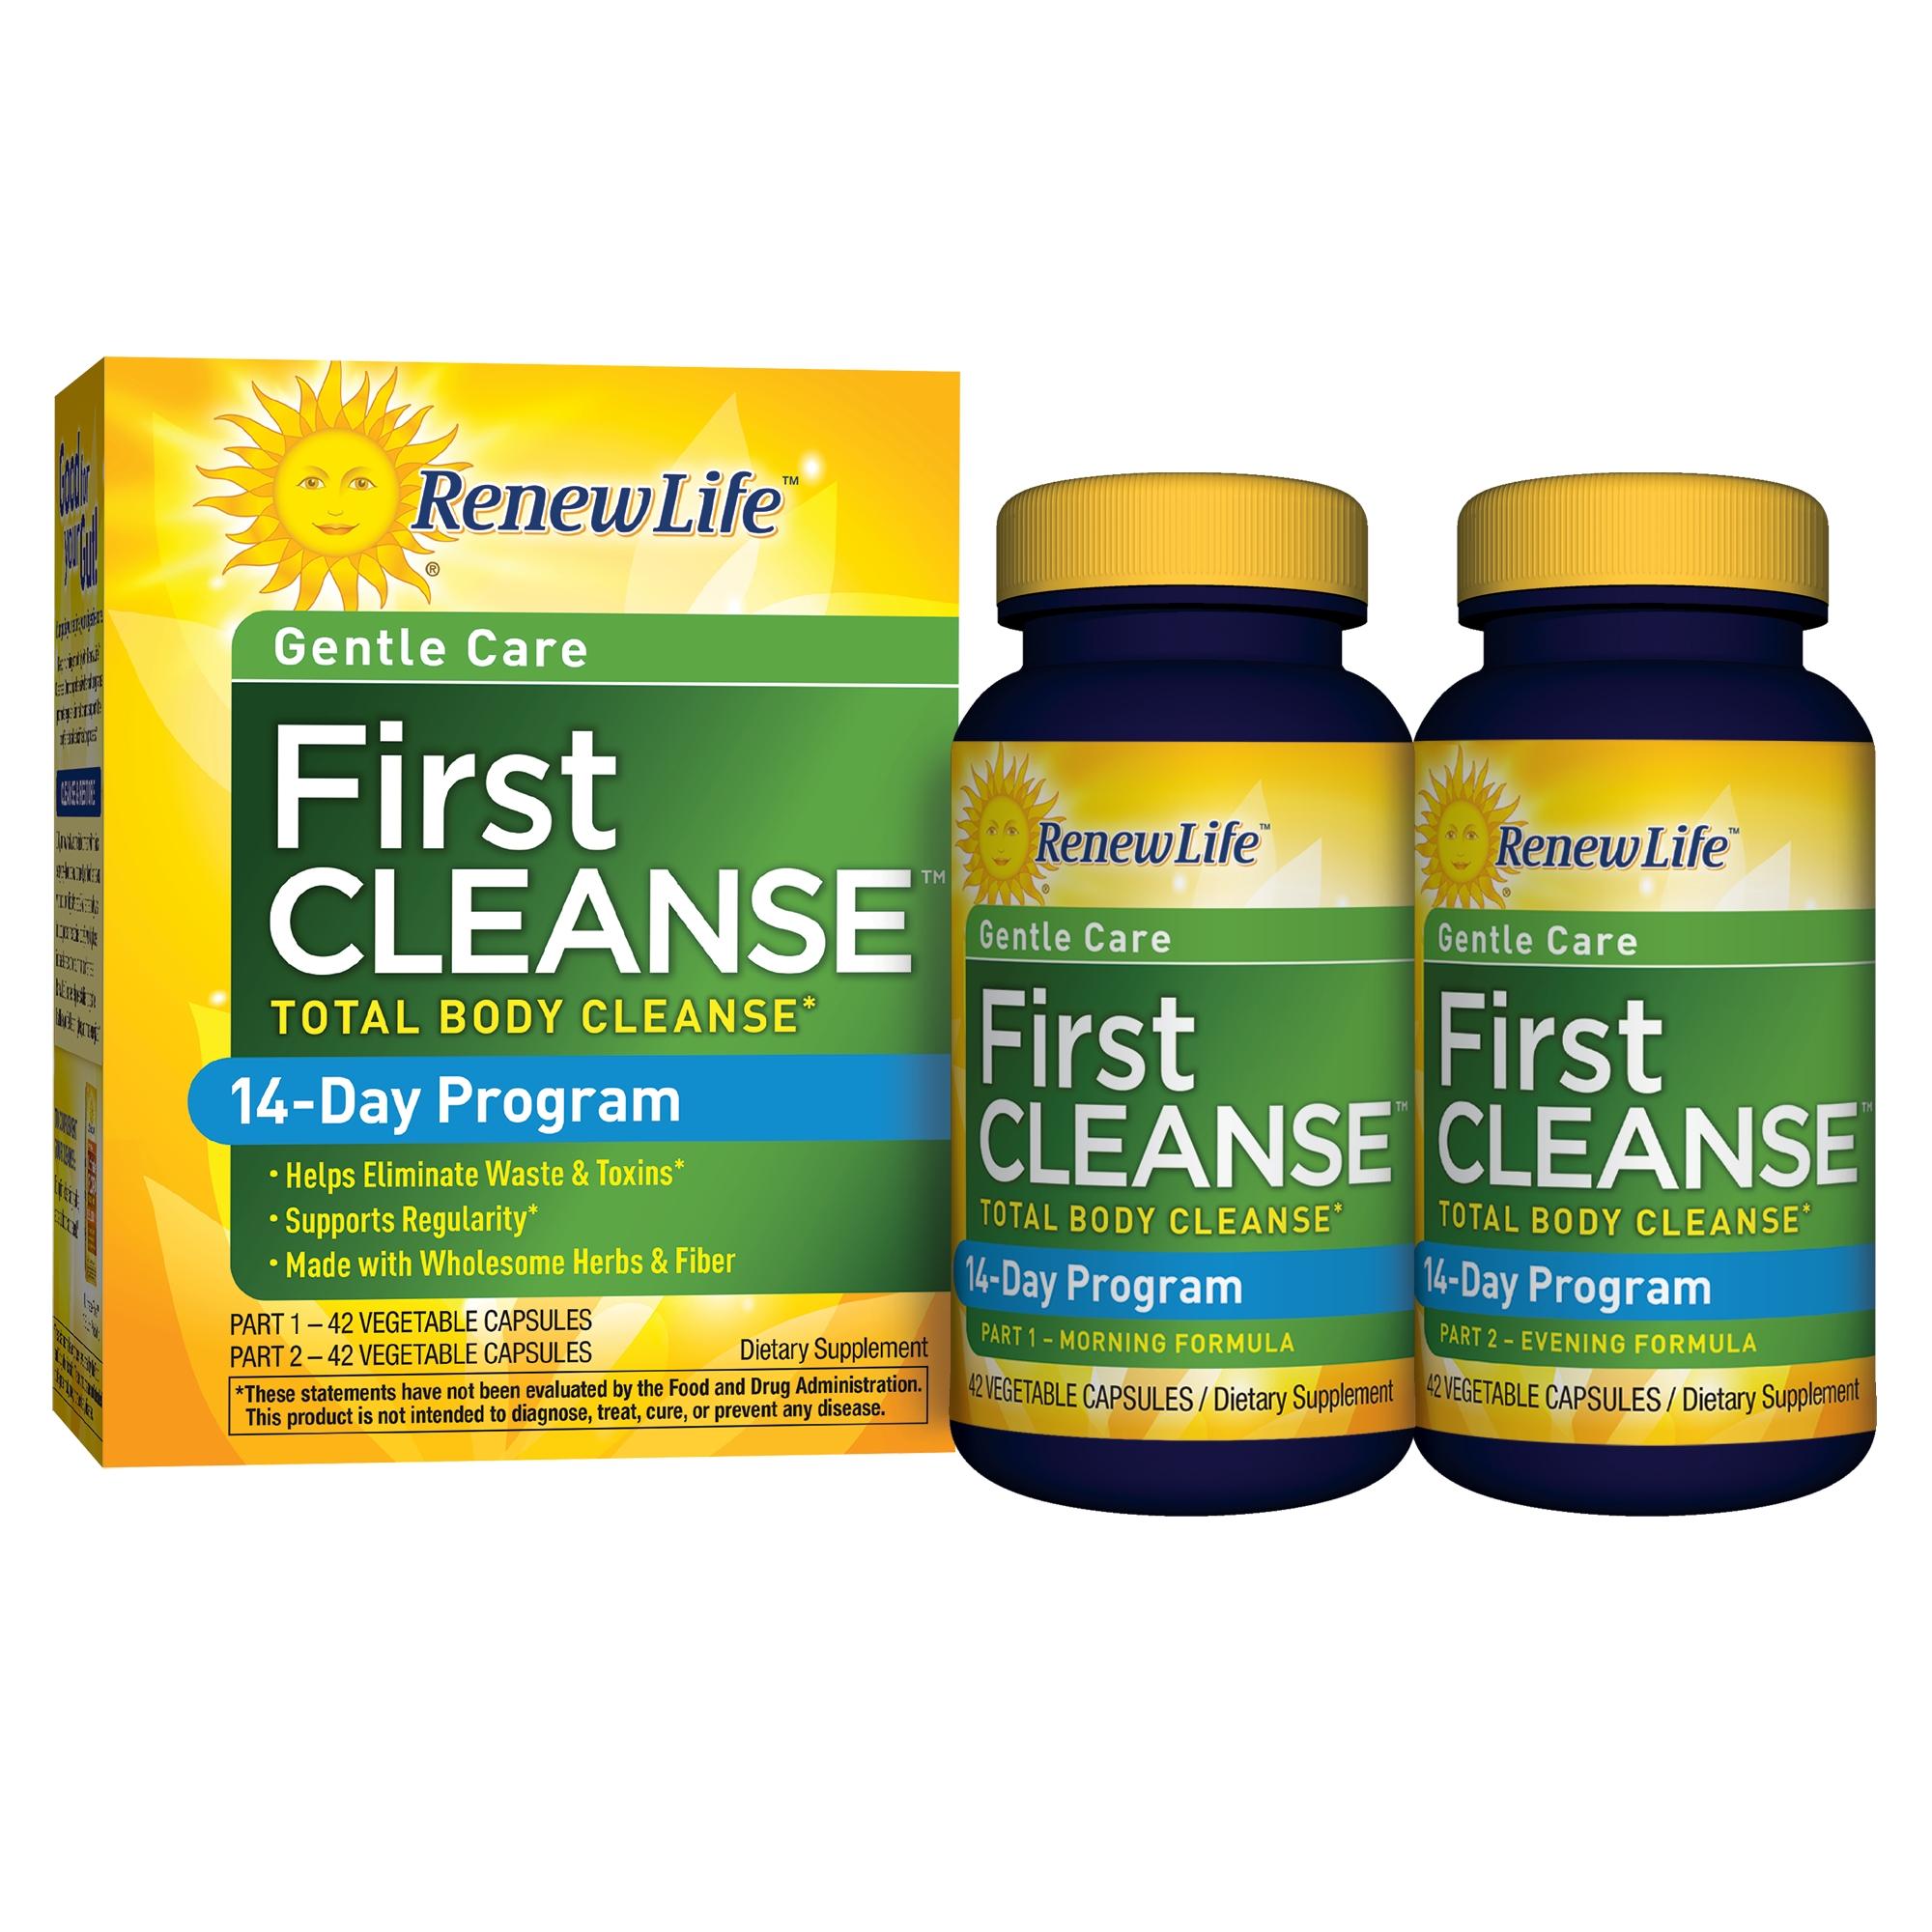 Renew Life First Cleanse - 14-Day Program, 2 Part Program